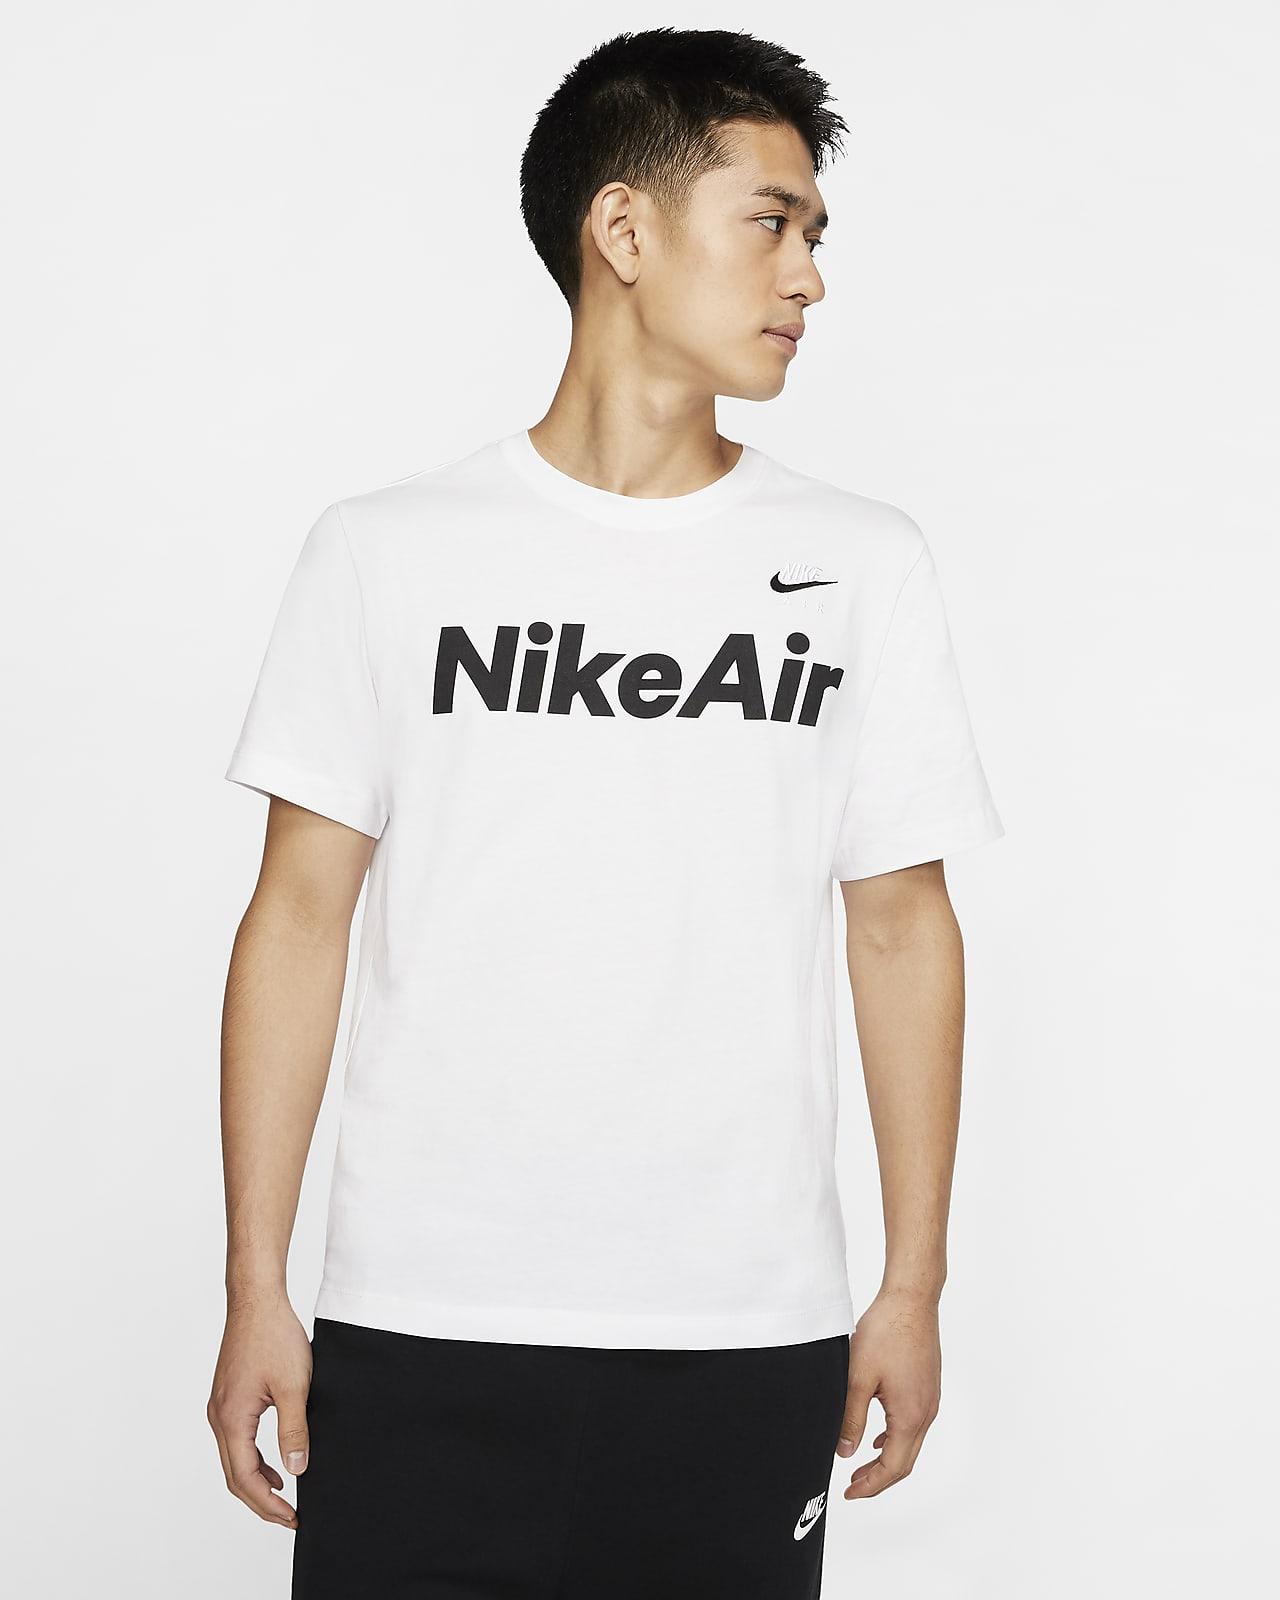 Nike Air Men's T-Shirt. Nike ID